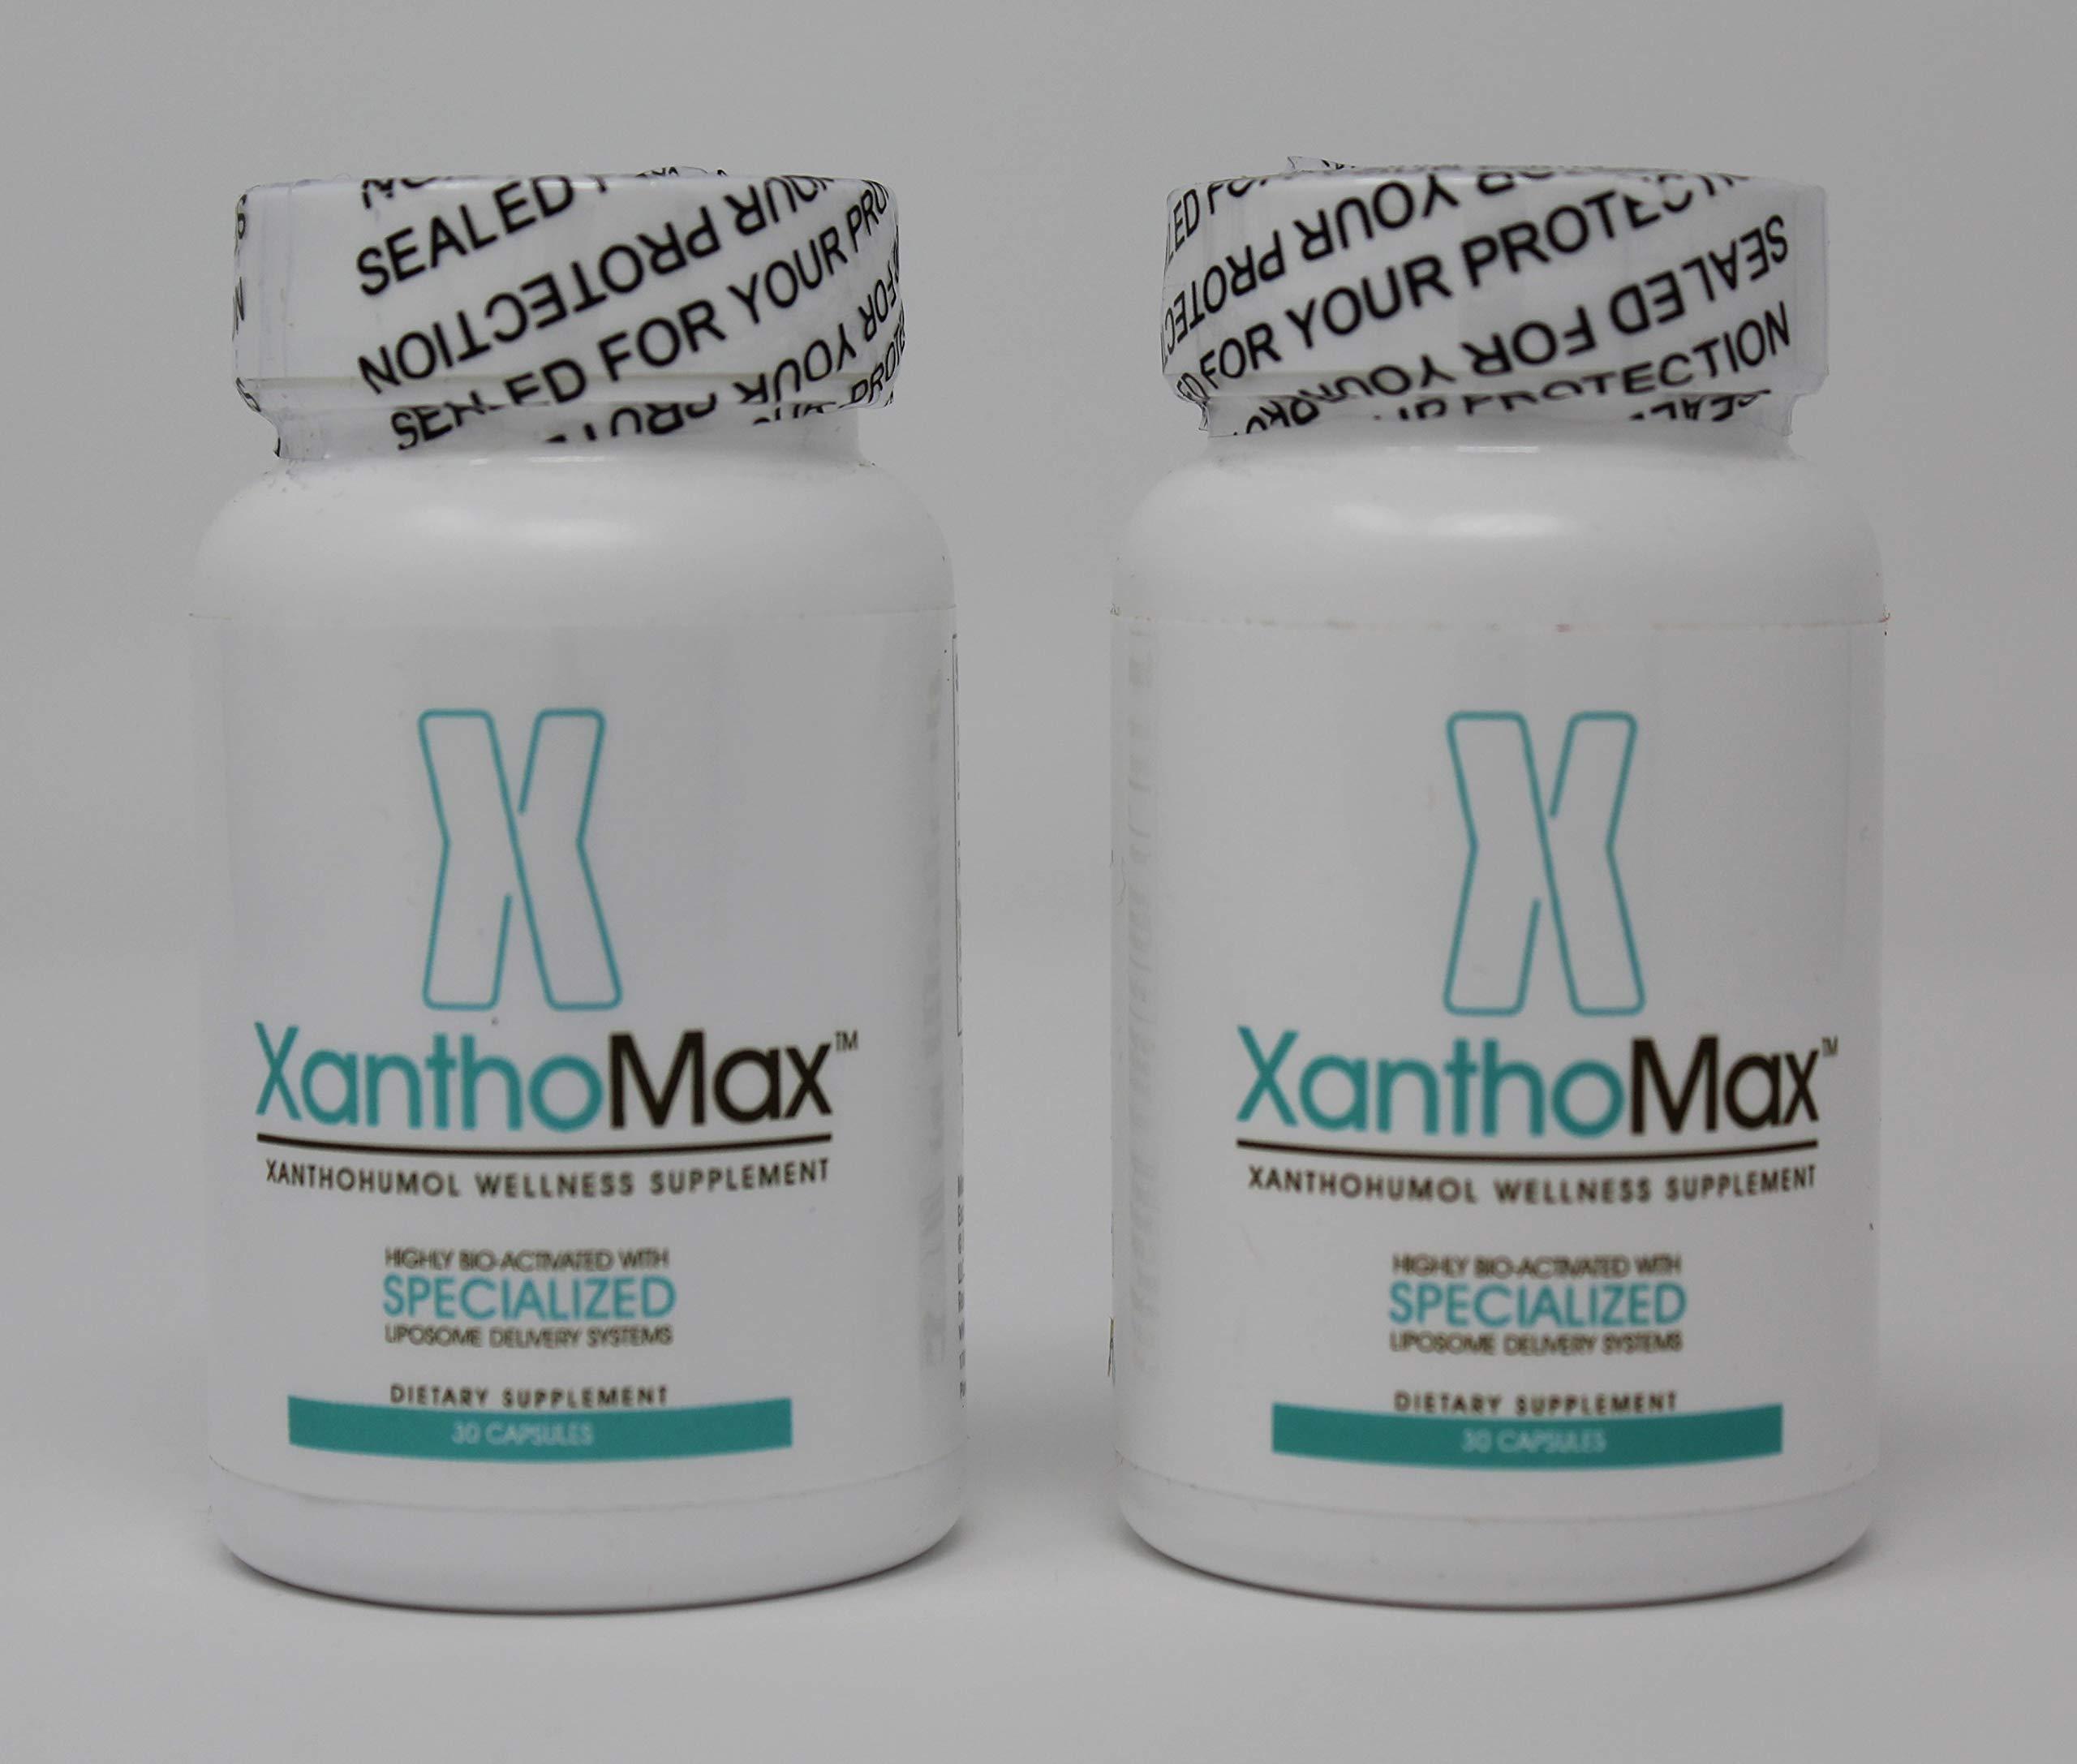 Xanthomax 30 caps (2 Bottles of 30 caps) by Elevacity (Image #1)